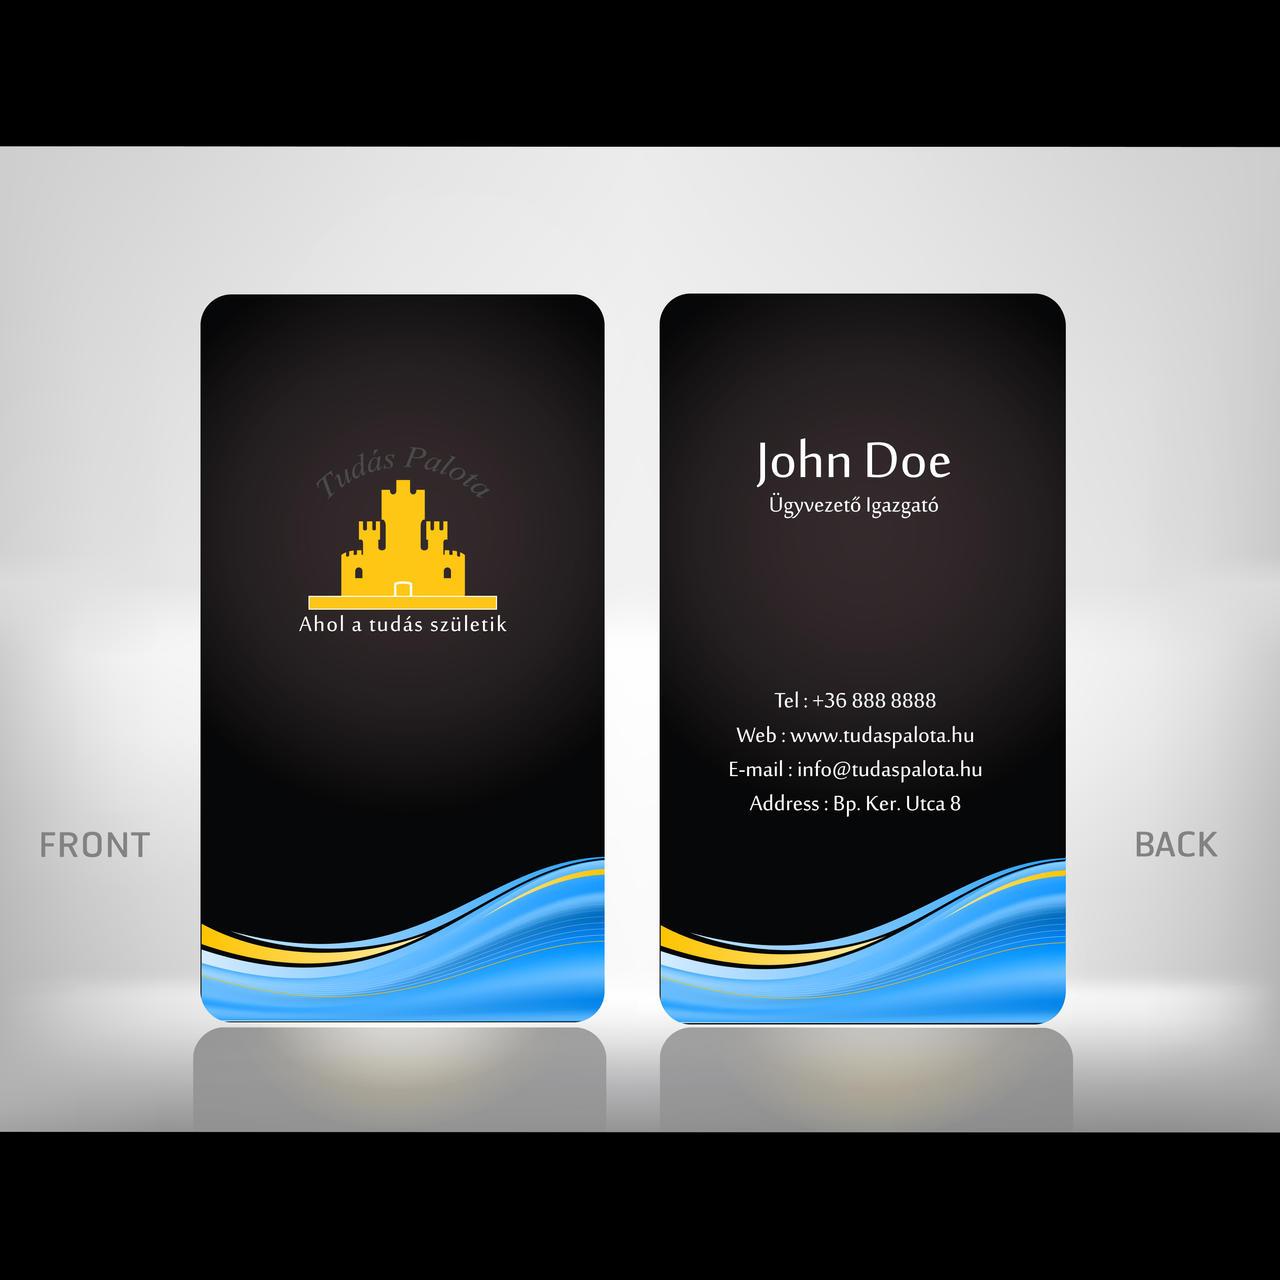 TudasPalota Business Card Sample by Hektor1020 on DeviantArt – Business Card Sample